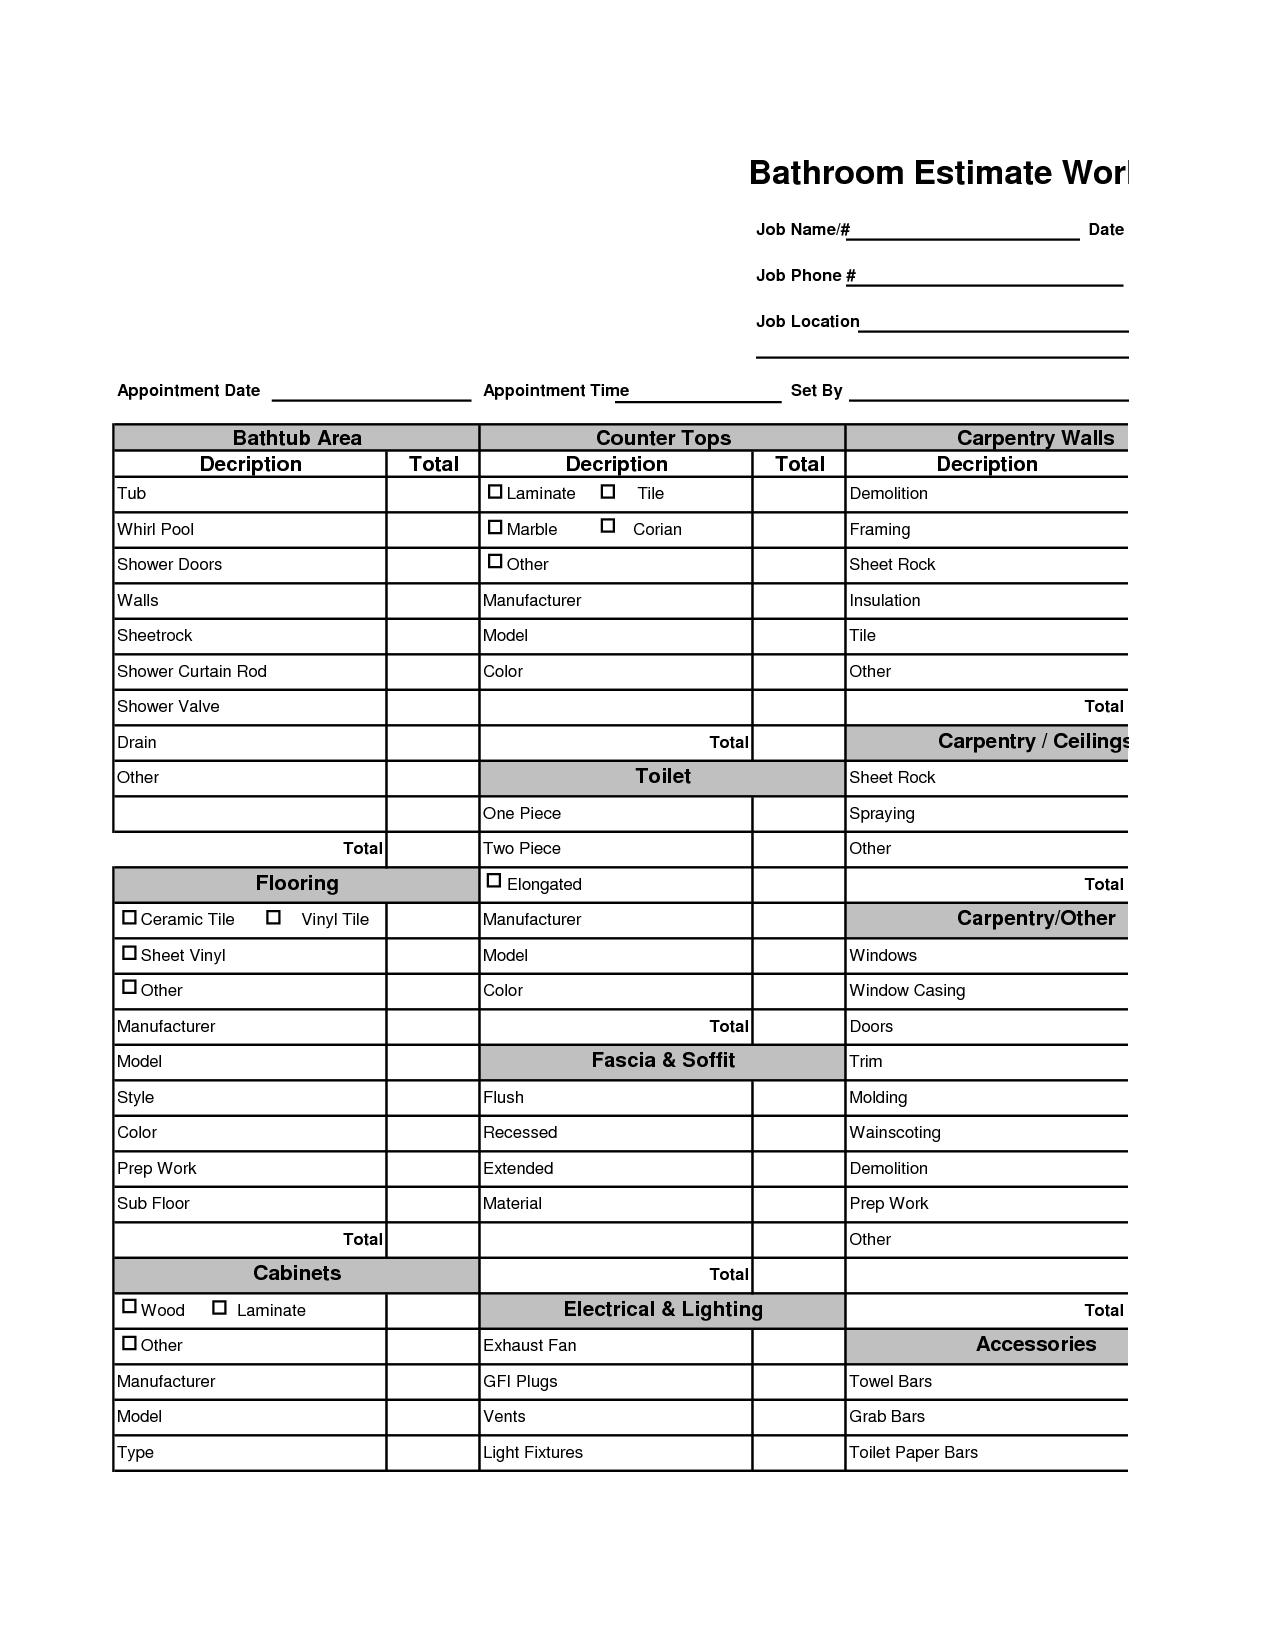 Home Remodeling Cost Estimator Bathroom Remodel Estimate